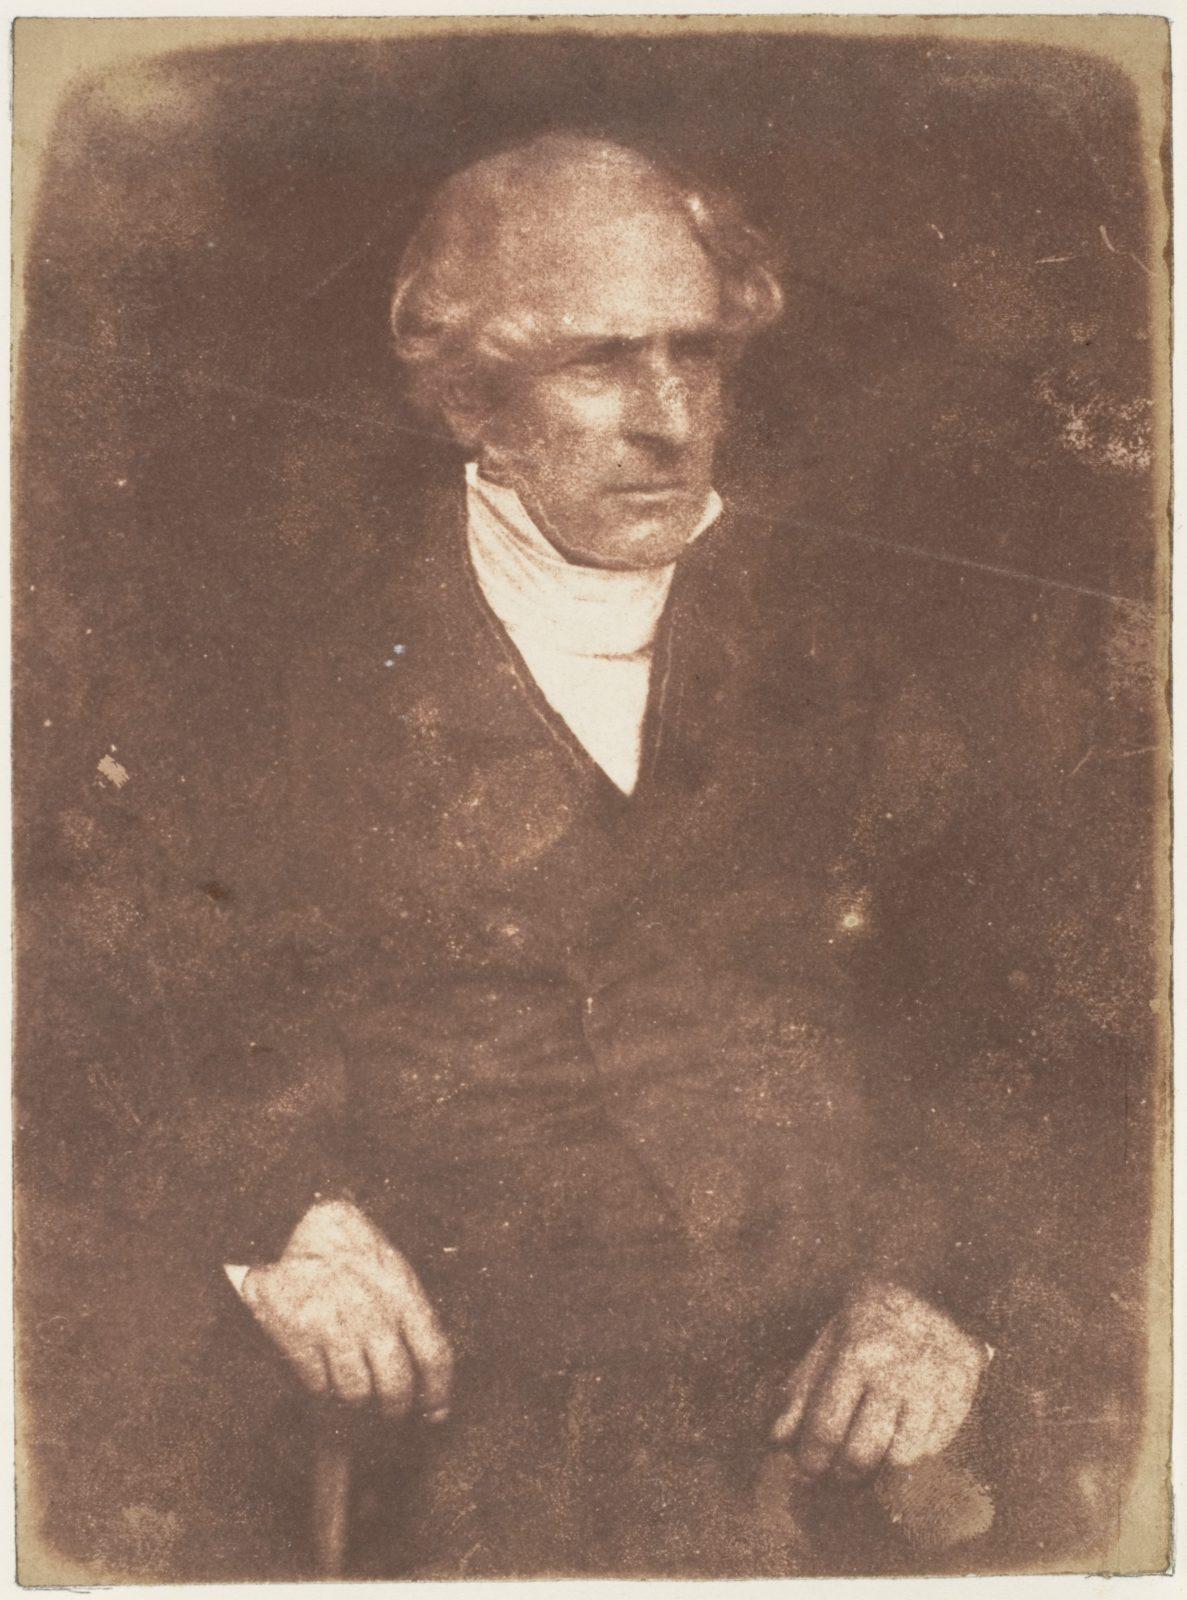 Rev. Thomas Jollie, Bowden